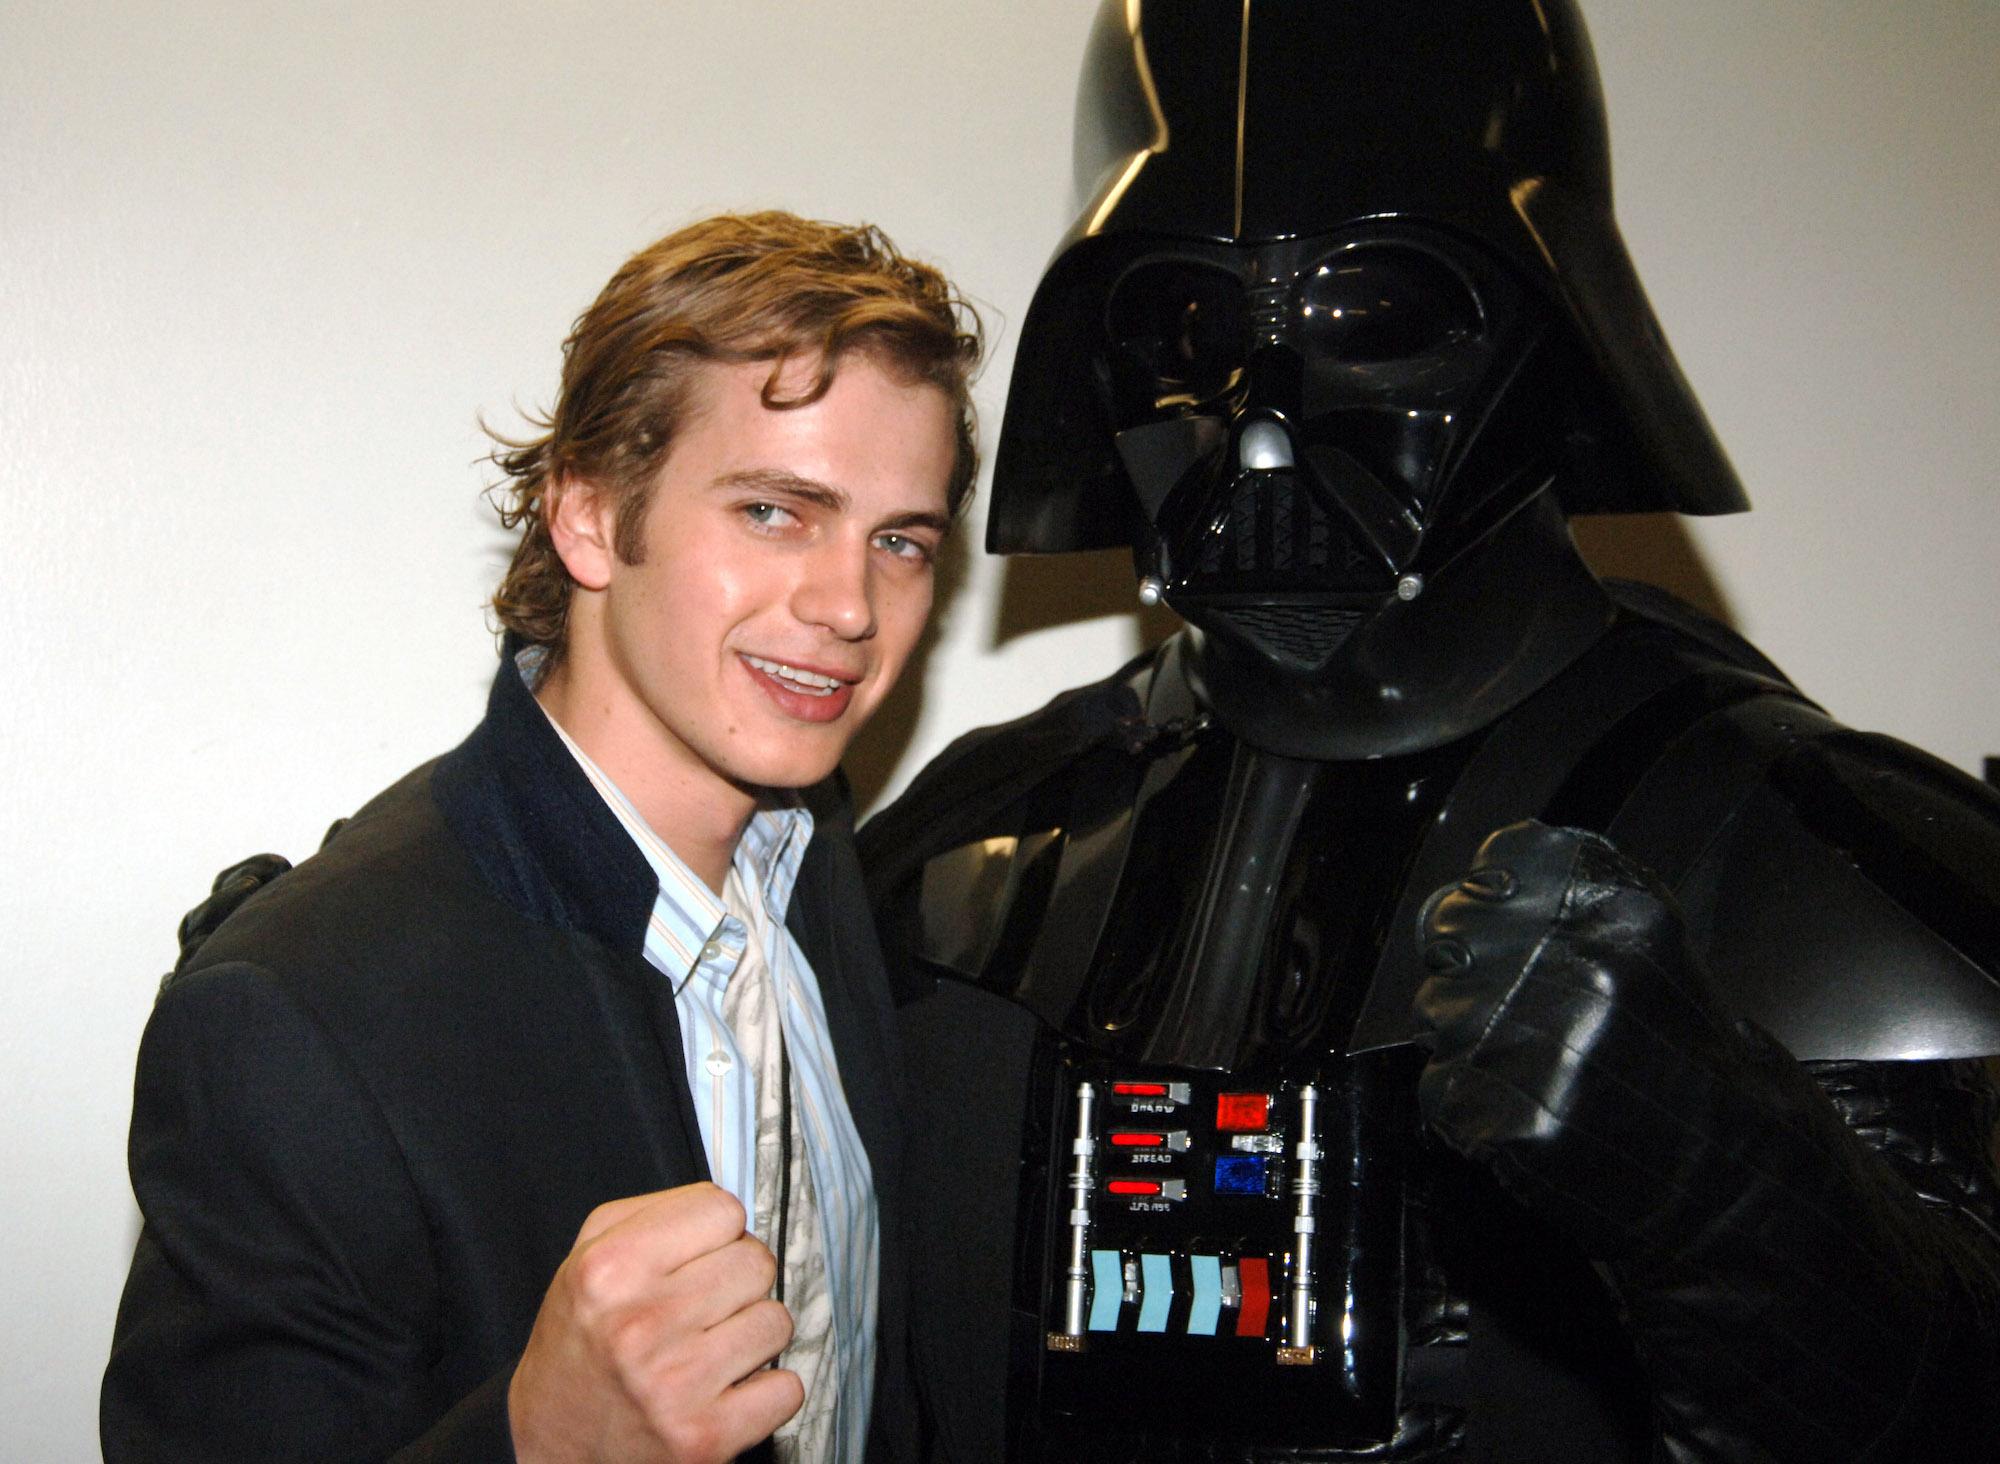 Hayden Christensen and Darth Vader at Nickelodeon's 18th Annual Kids Choice Awards, April 2005